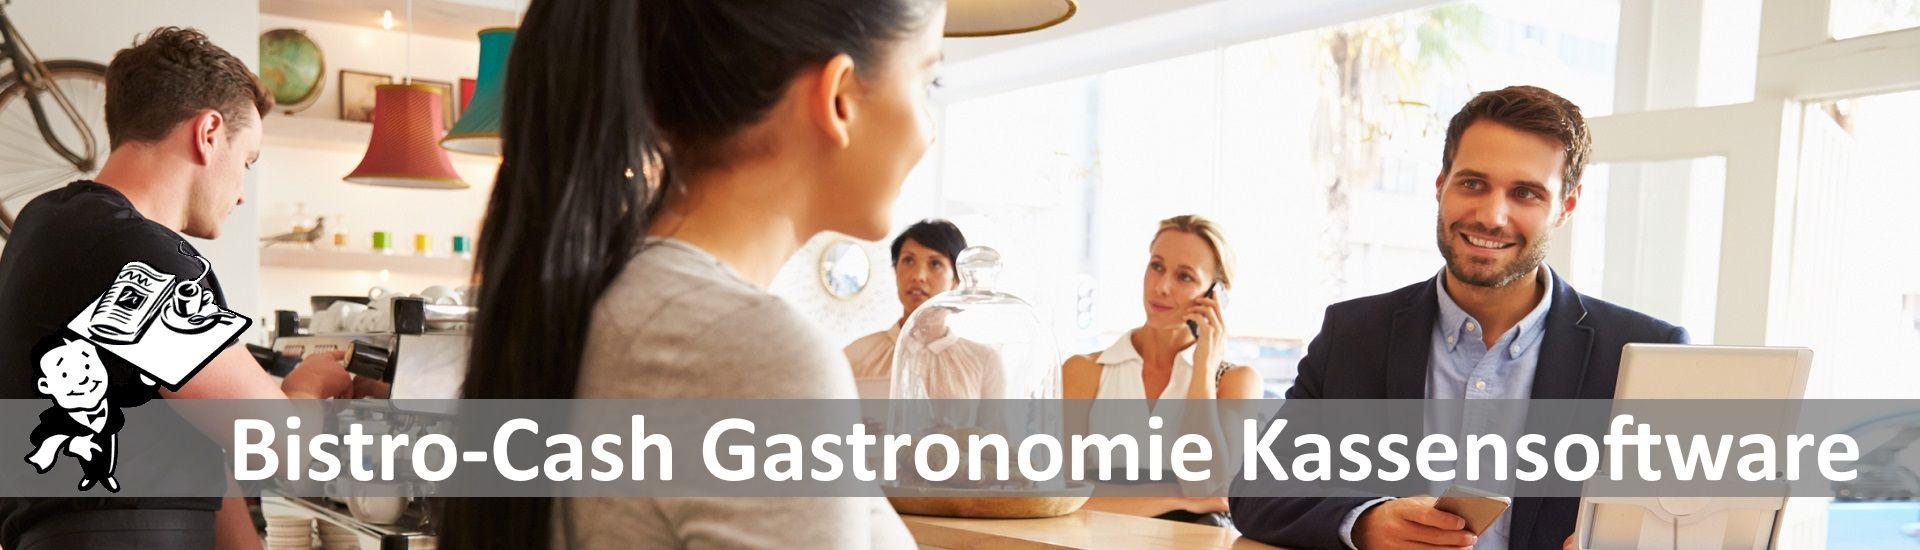 Gastronomie Kassensoftware Bistro-Cash